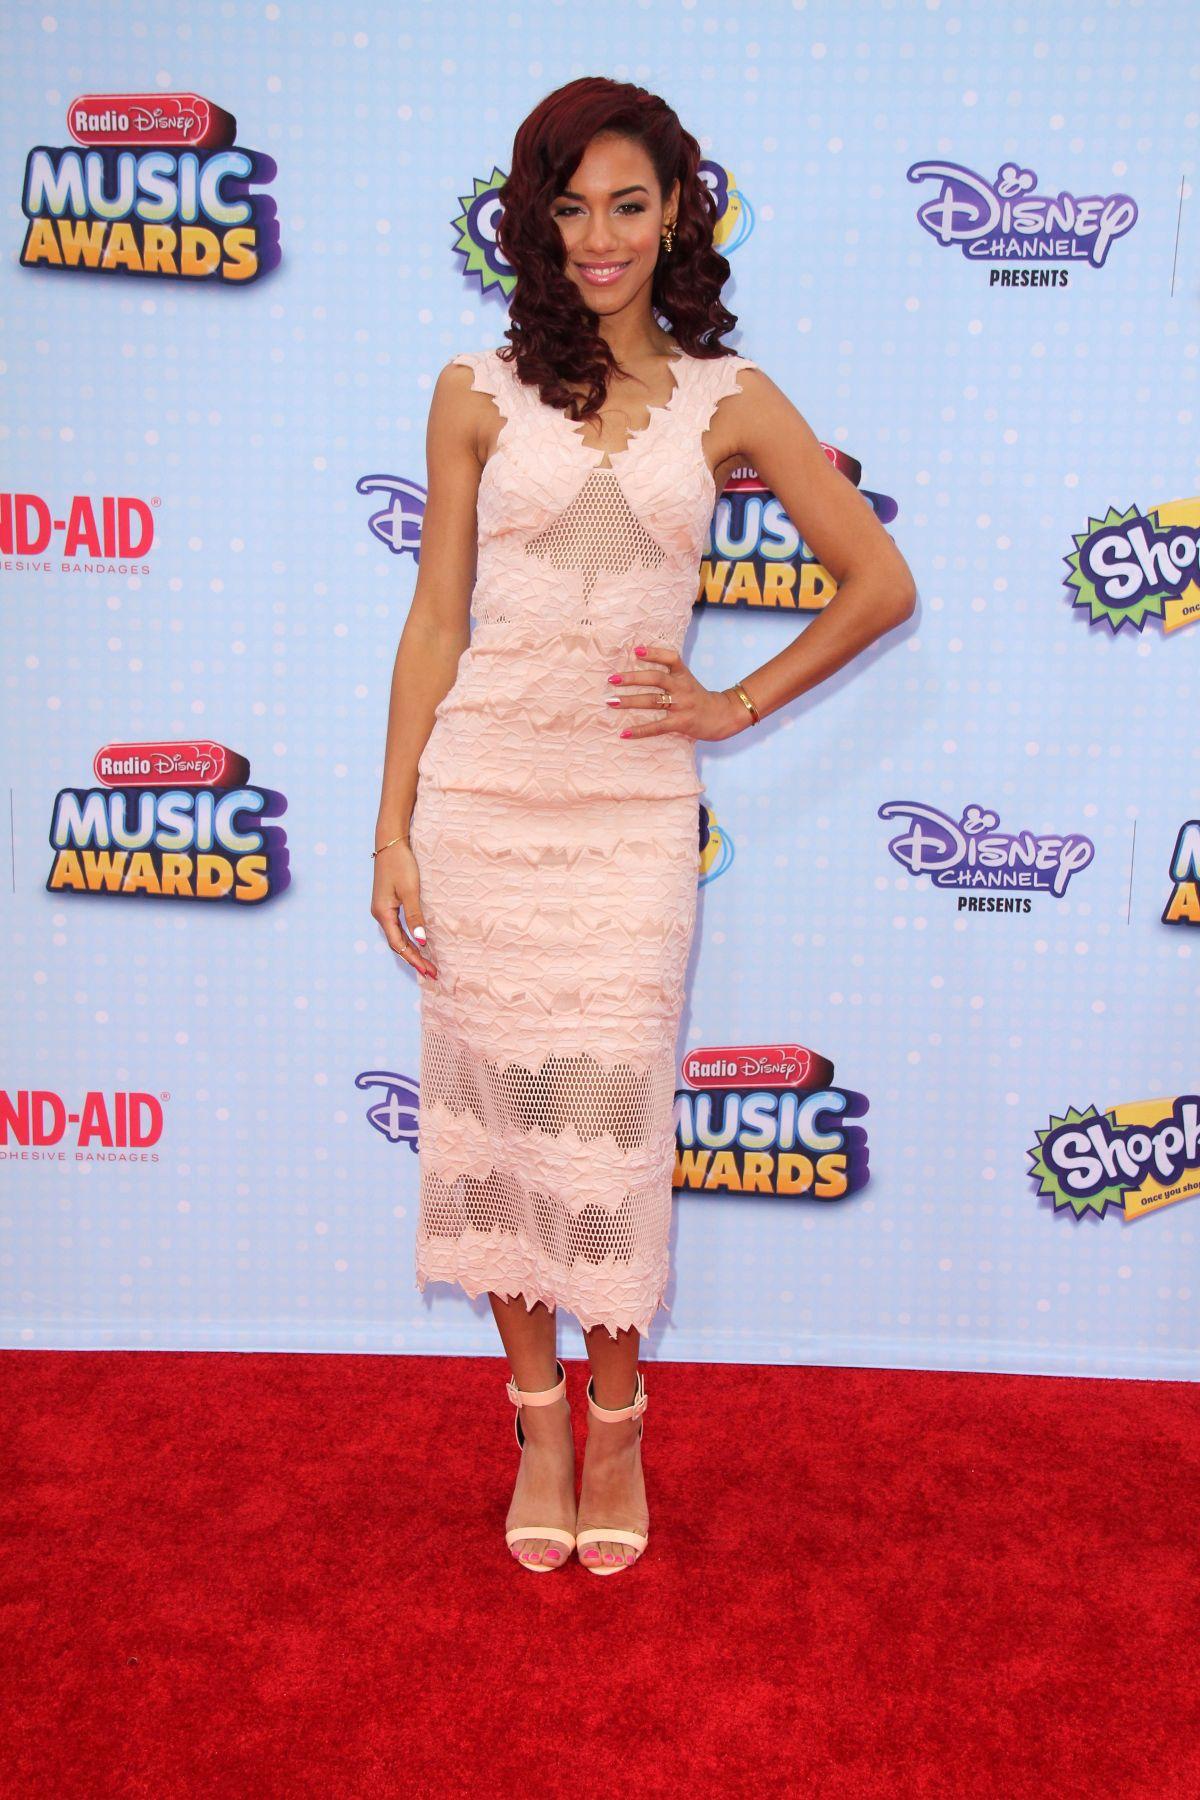 NATALIE LA ROSE at 2015 Radio Disney Music Awards in Los Angeles